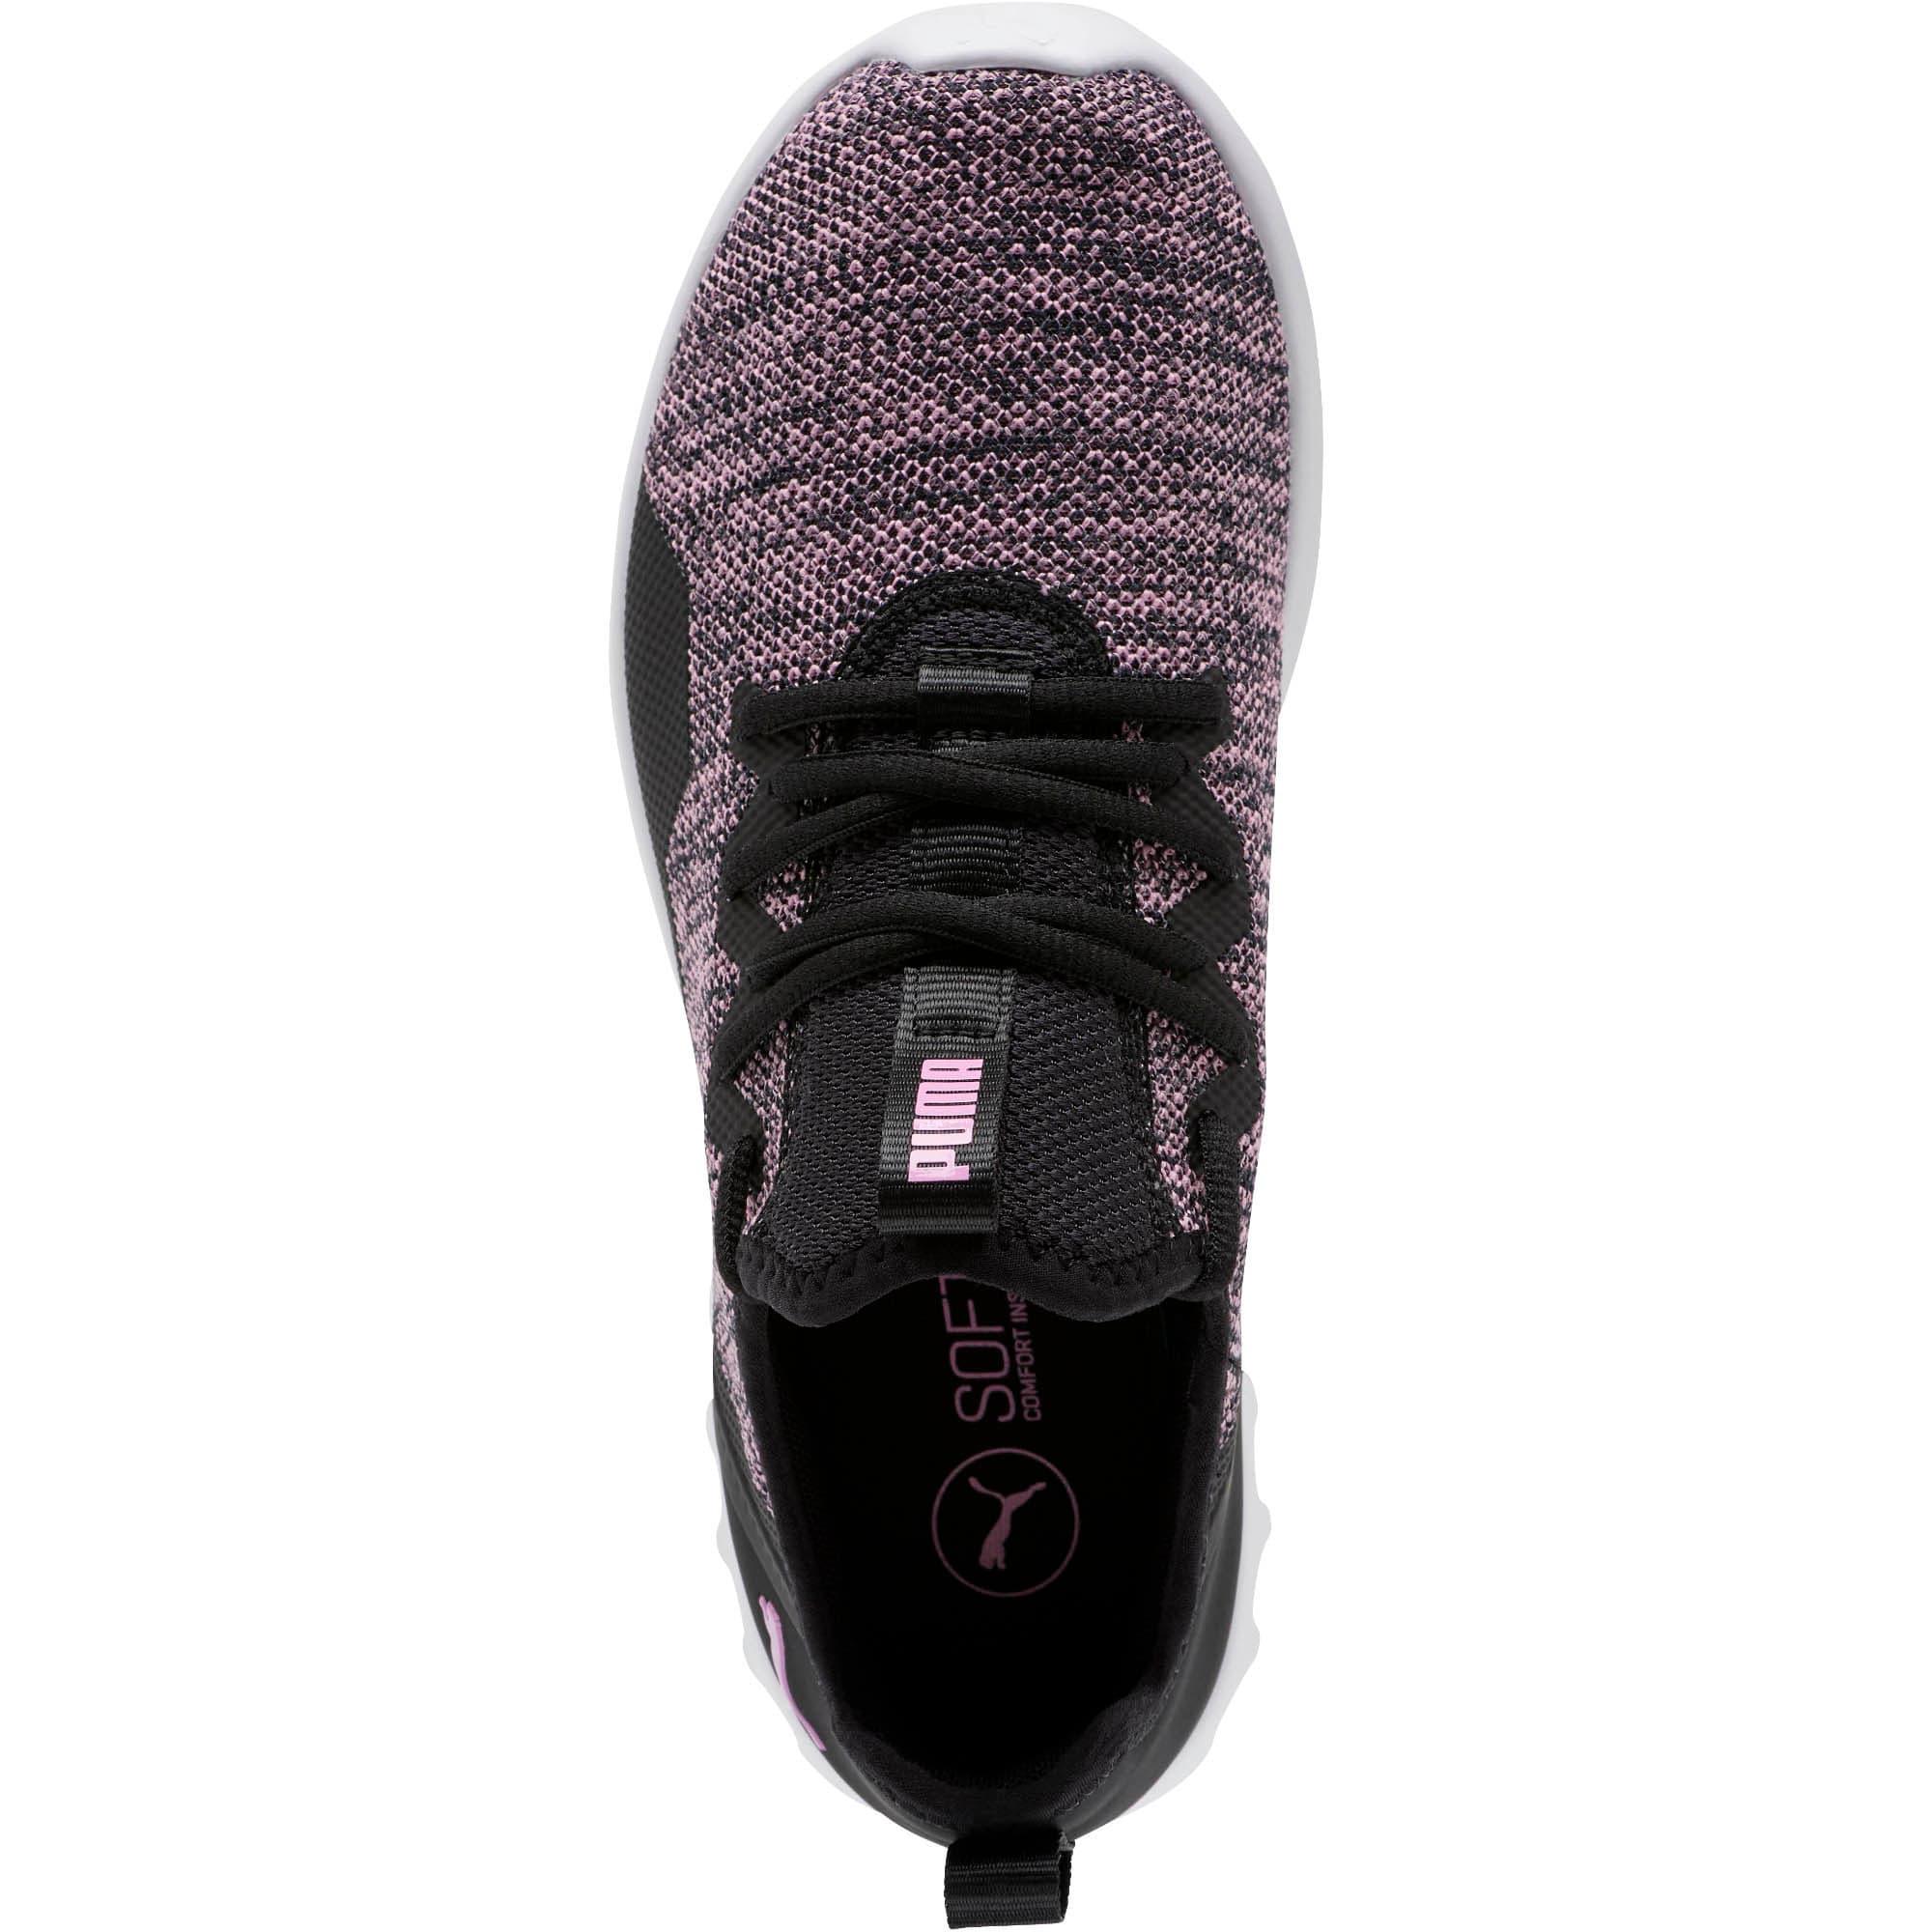 Thumbnail 6 of Carson 2 X Knit Women's Running Shoes, Puma Black-Orchid, medium